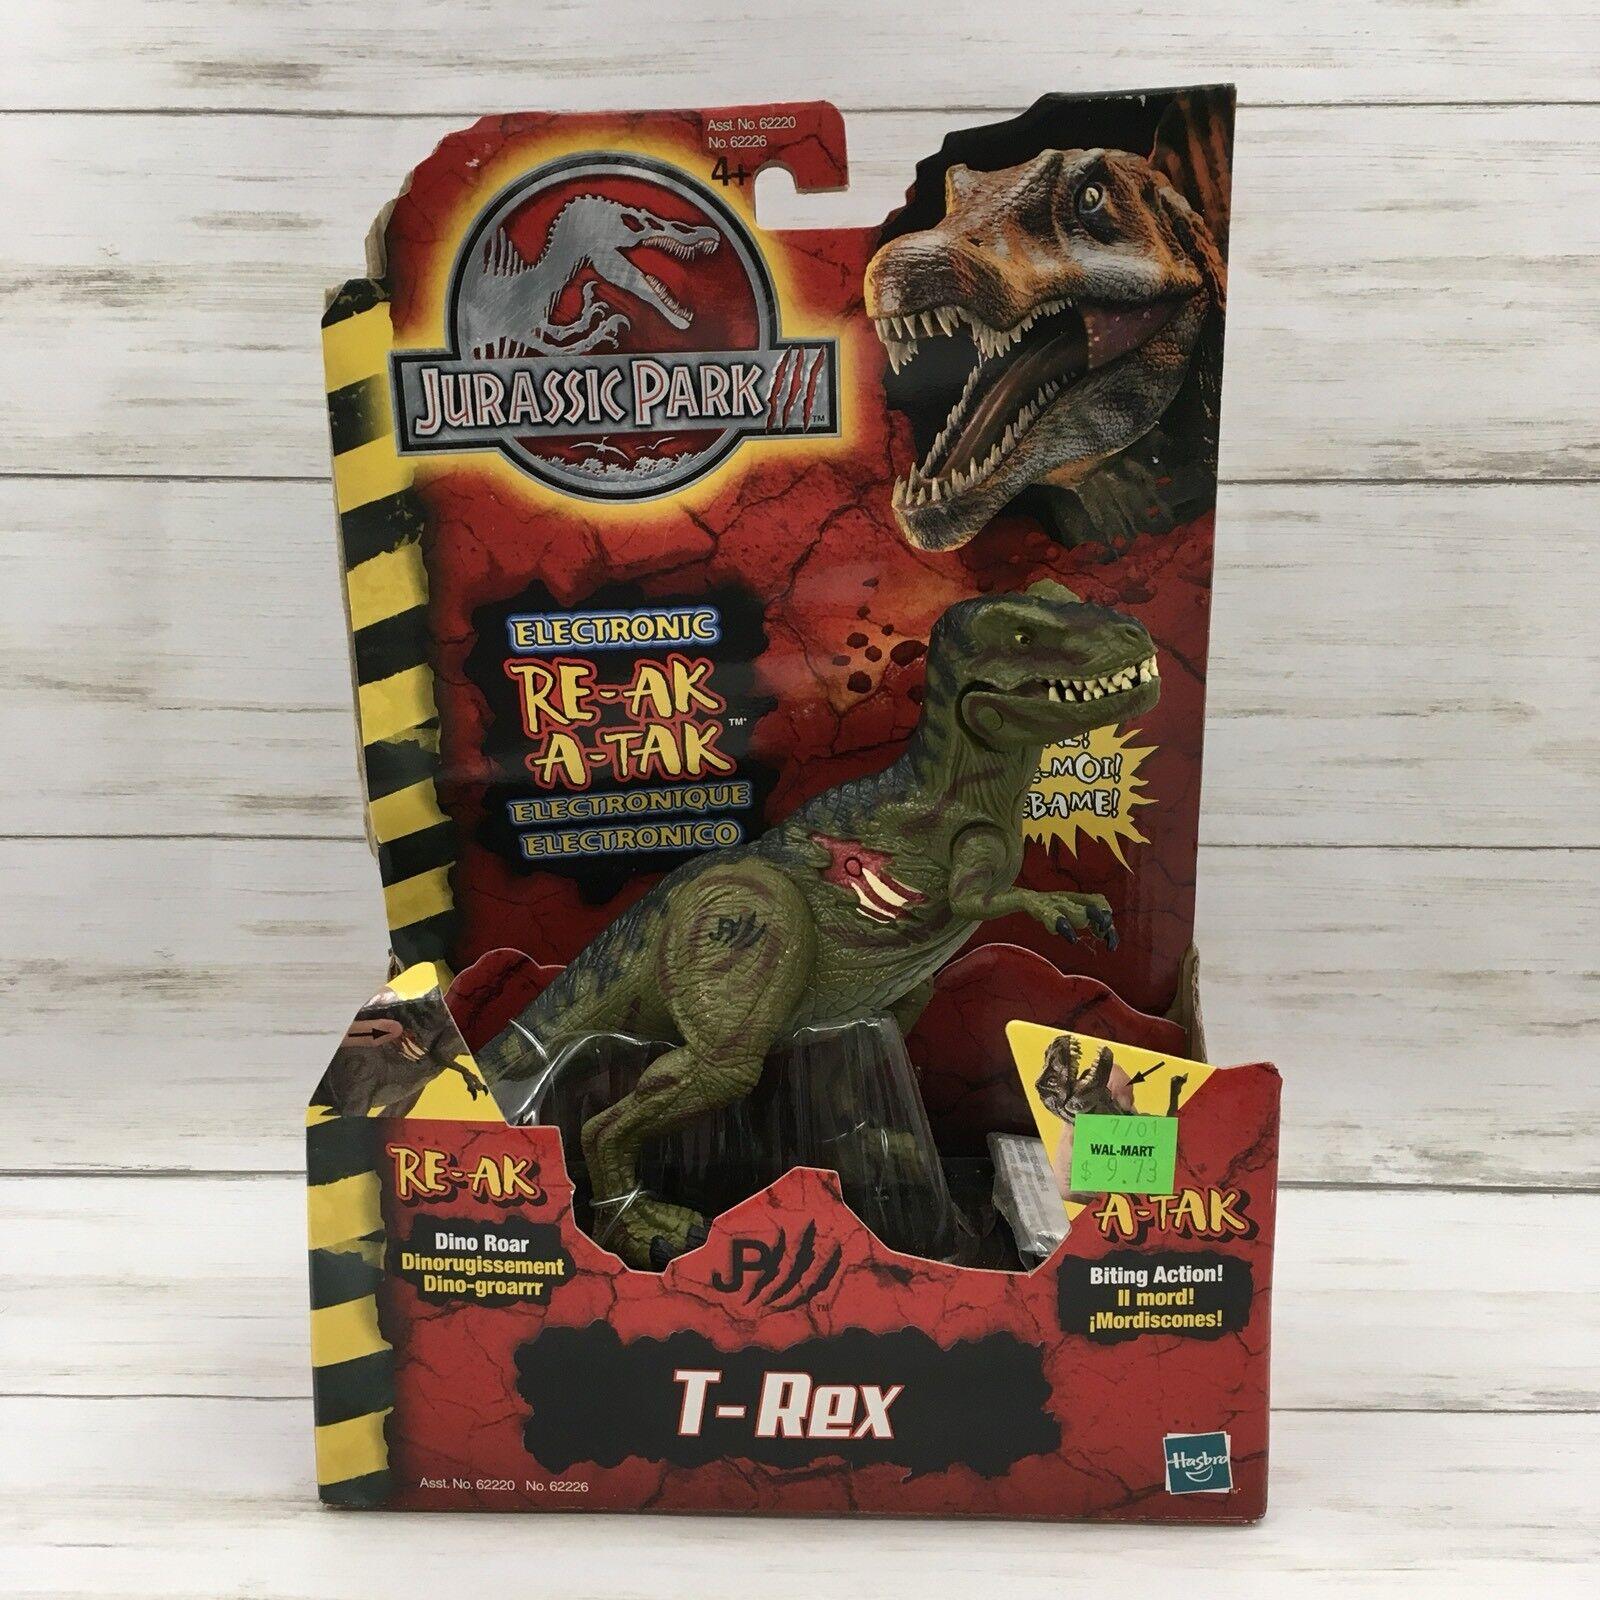 Hasbro 2018 Jurassic Park 3 re-ak a-Tak T-Rex 62226 Sellado Dinosaurio  B